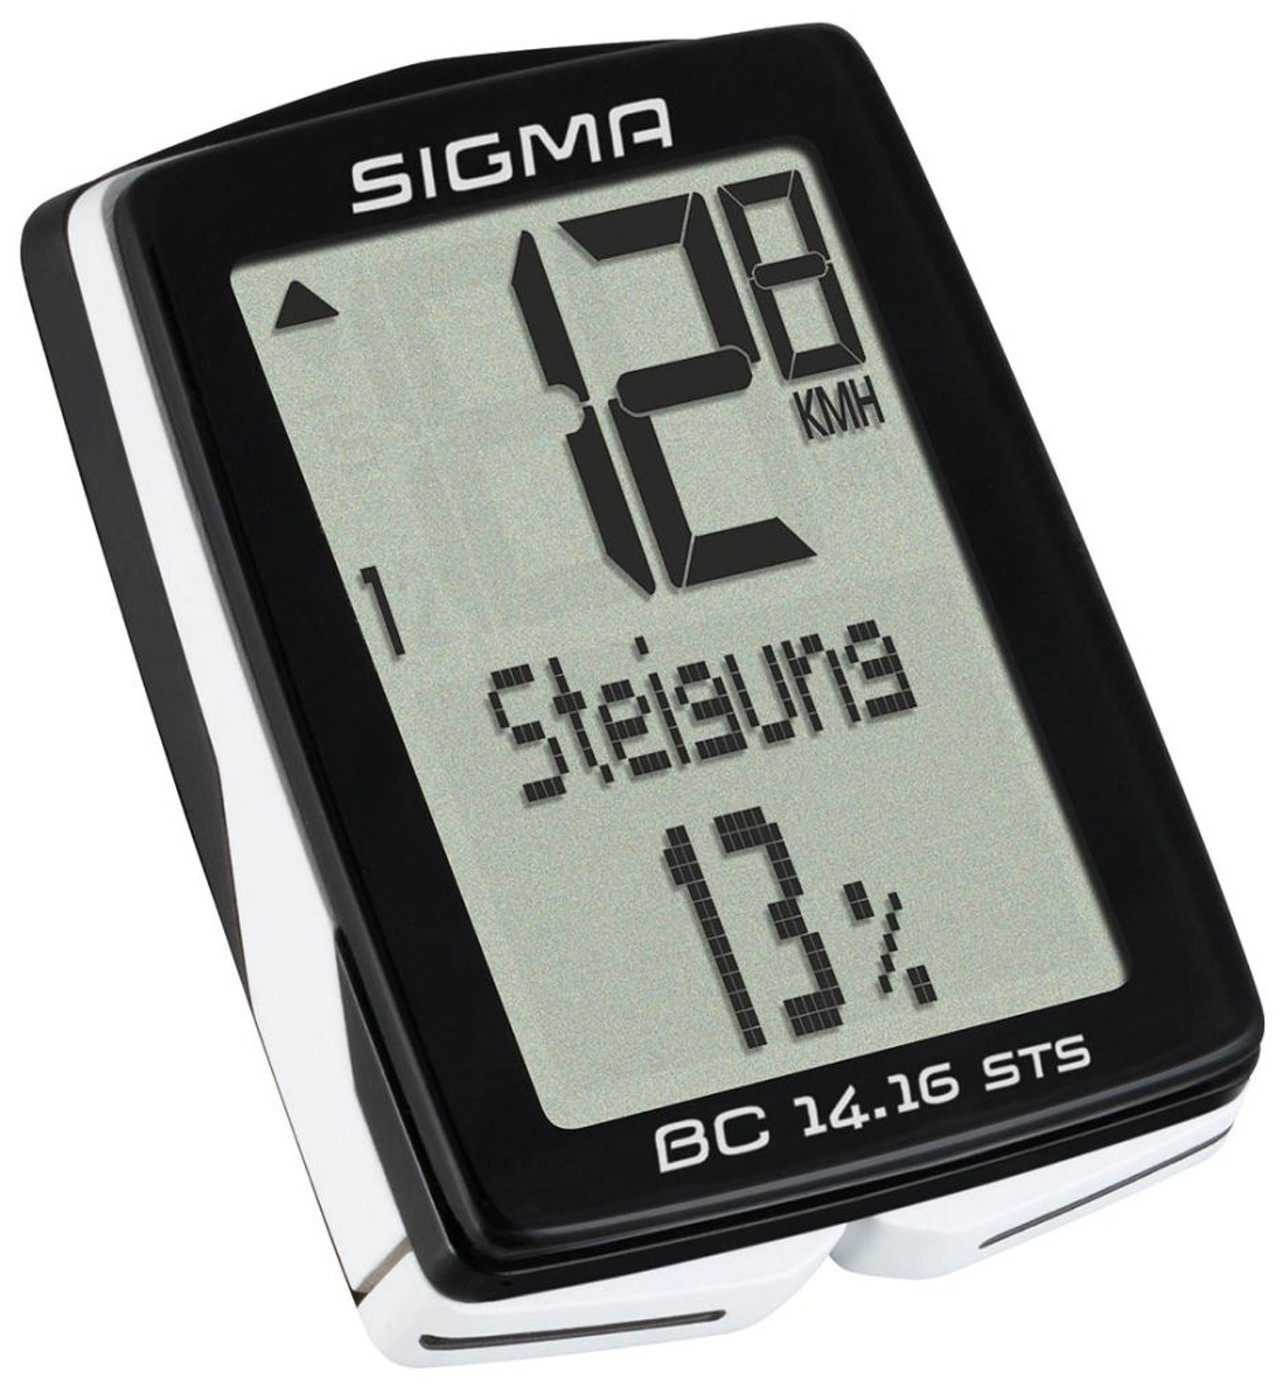 SIGMA Radcomputer BC 14.16 STS Cadence